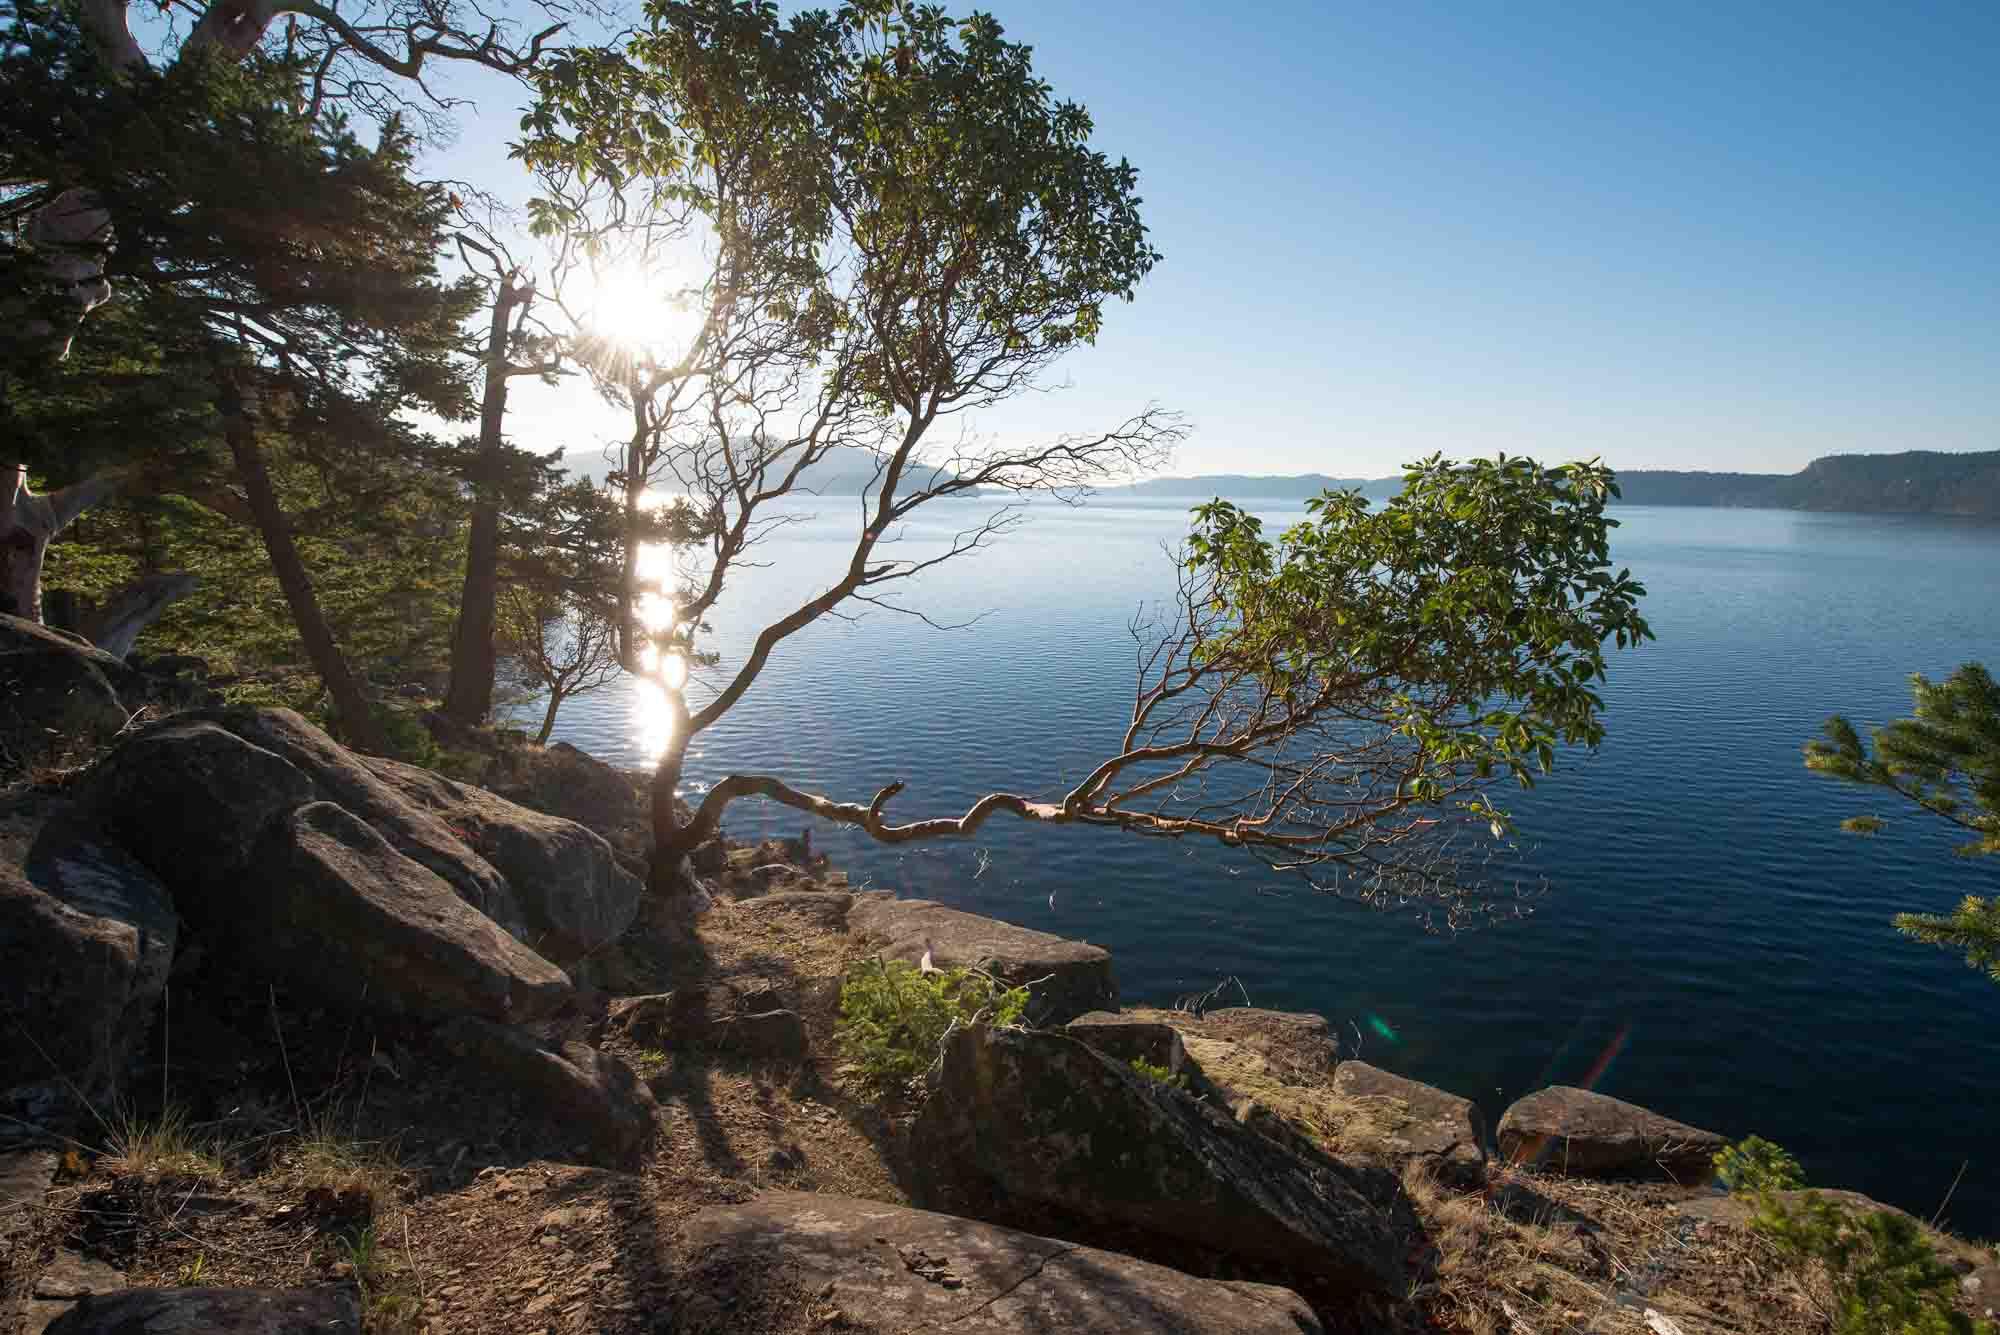 Mt Parke Mayne Island